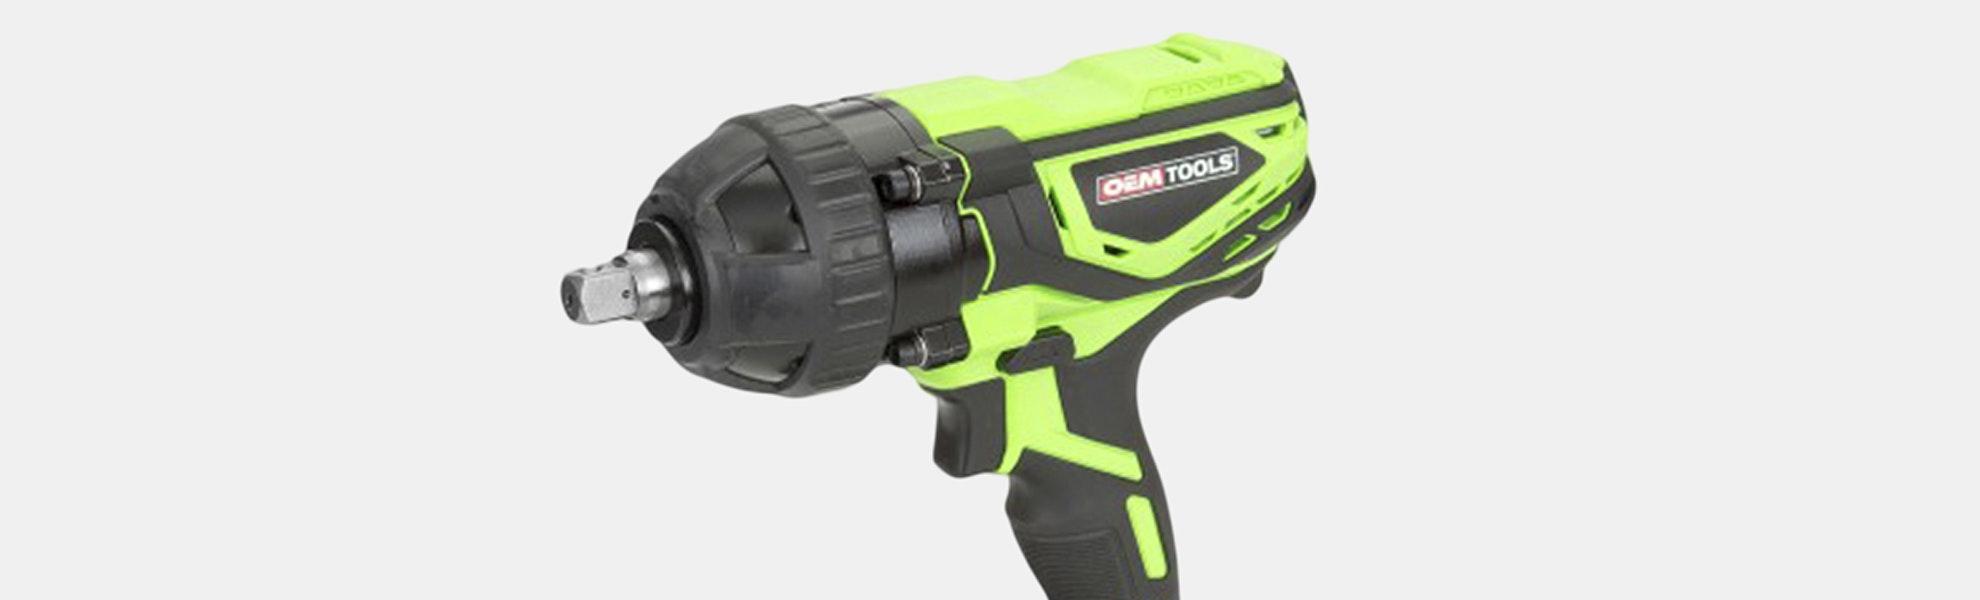 "OEMTools Heavy Duty 1/2"" Drive Li-Ion Impact Wrench"